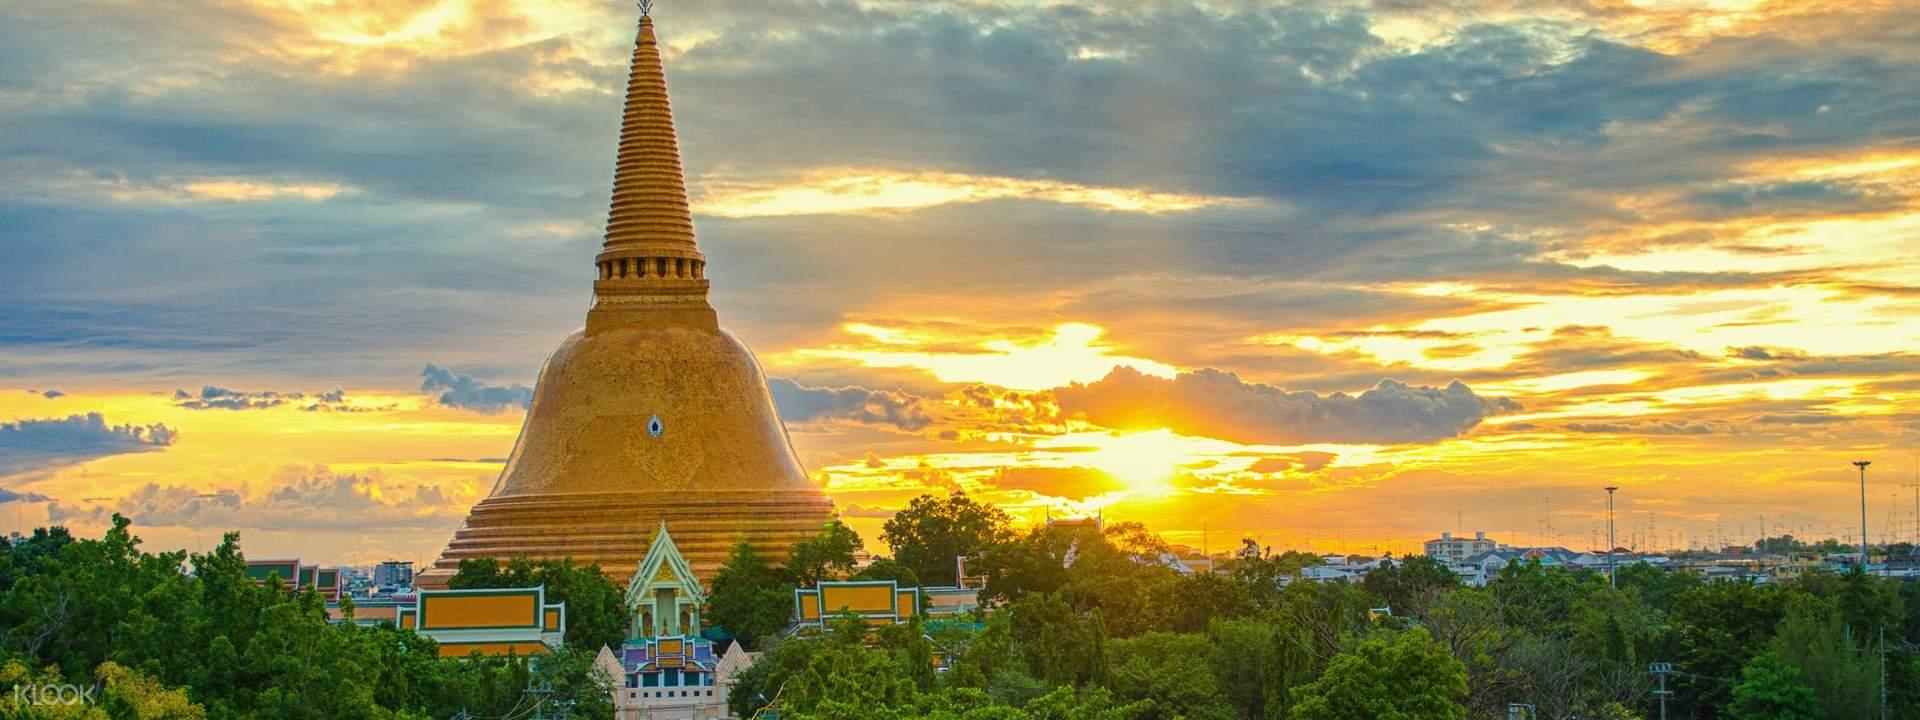 Nakhon Pathom Private Tour from Bangkok by AK Travel